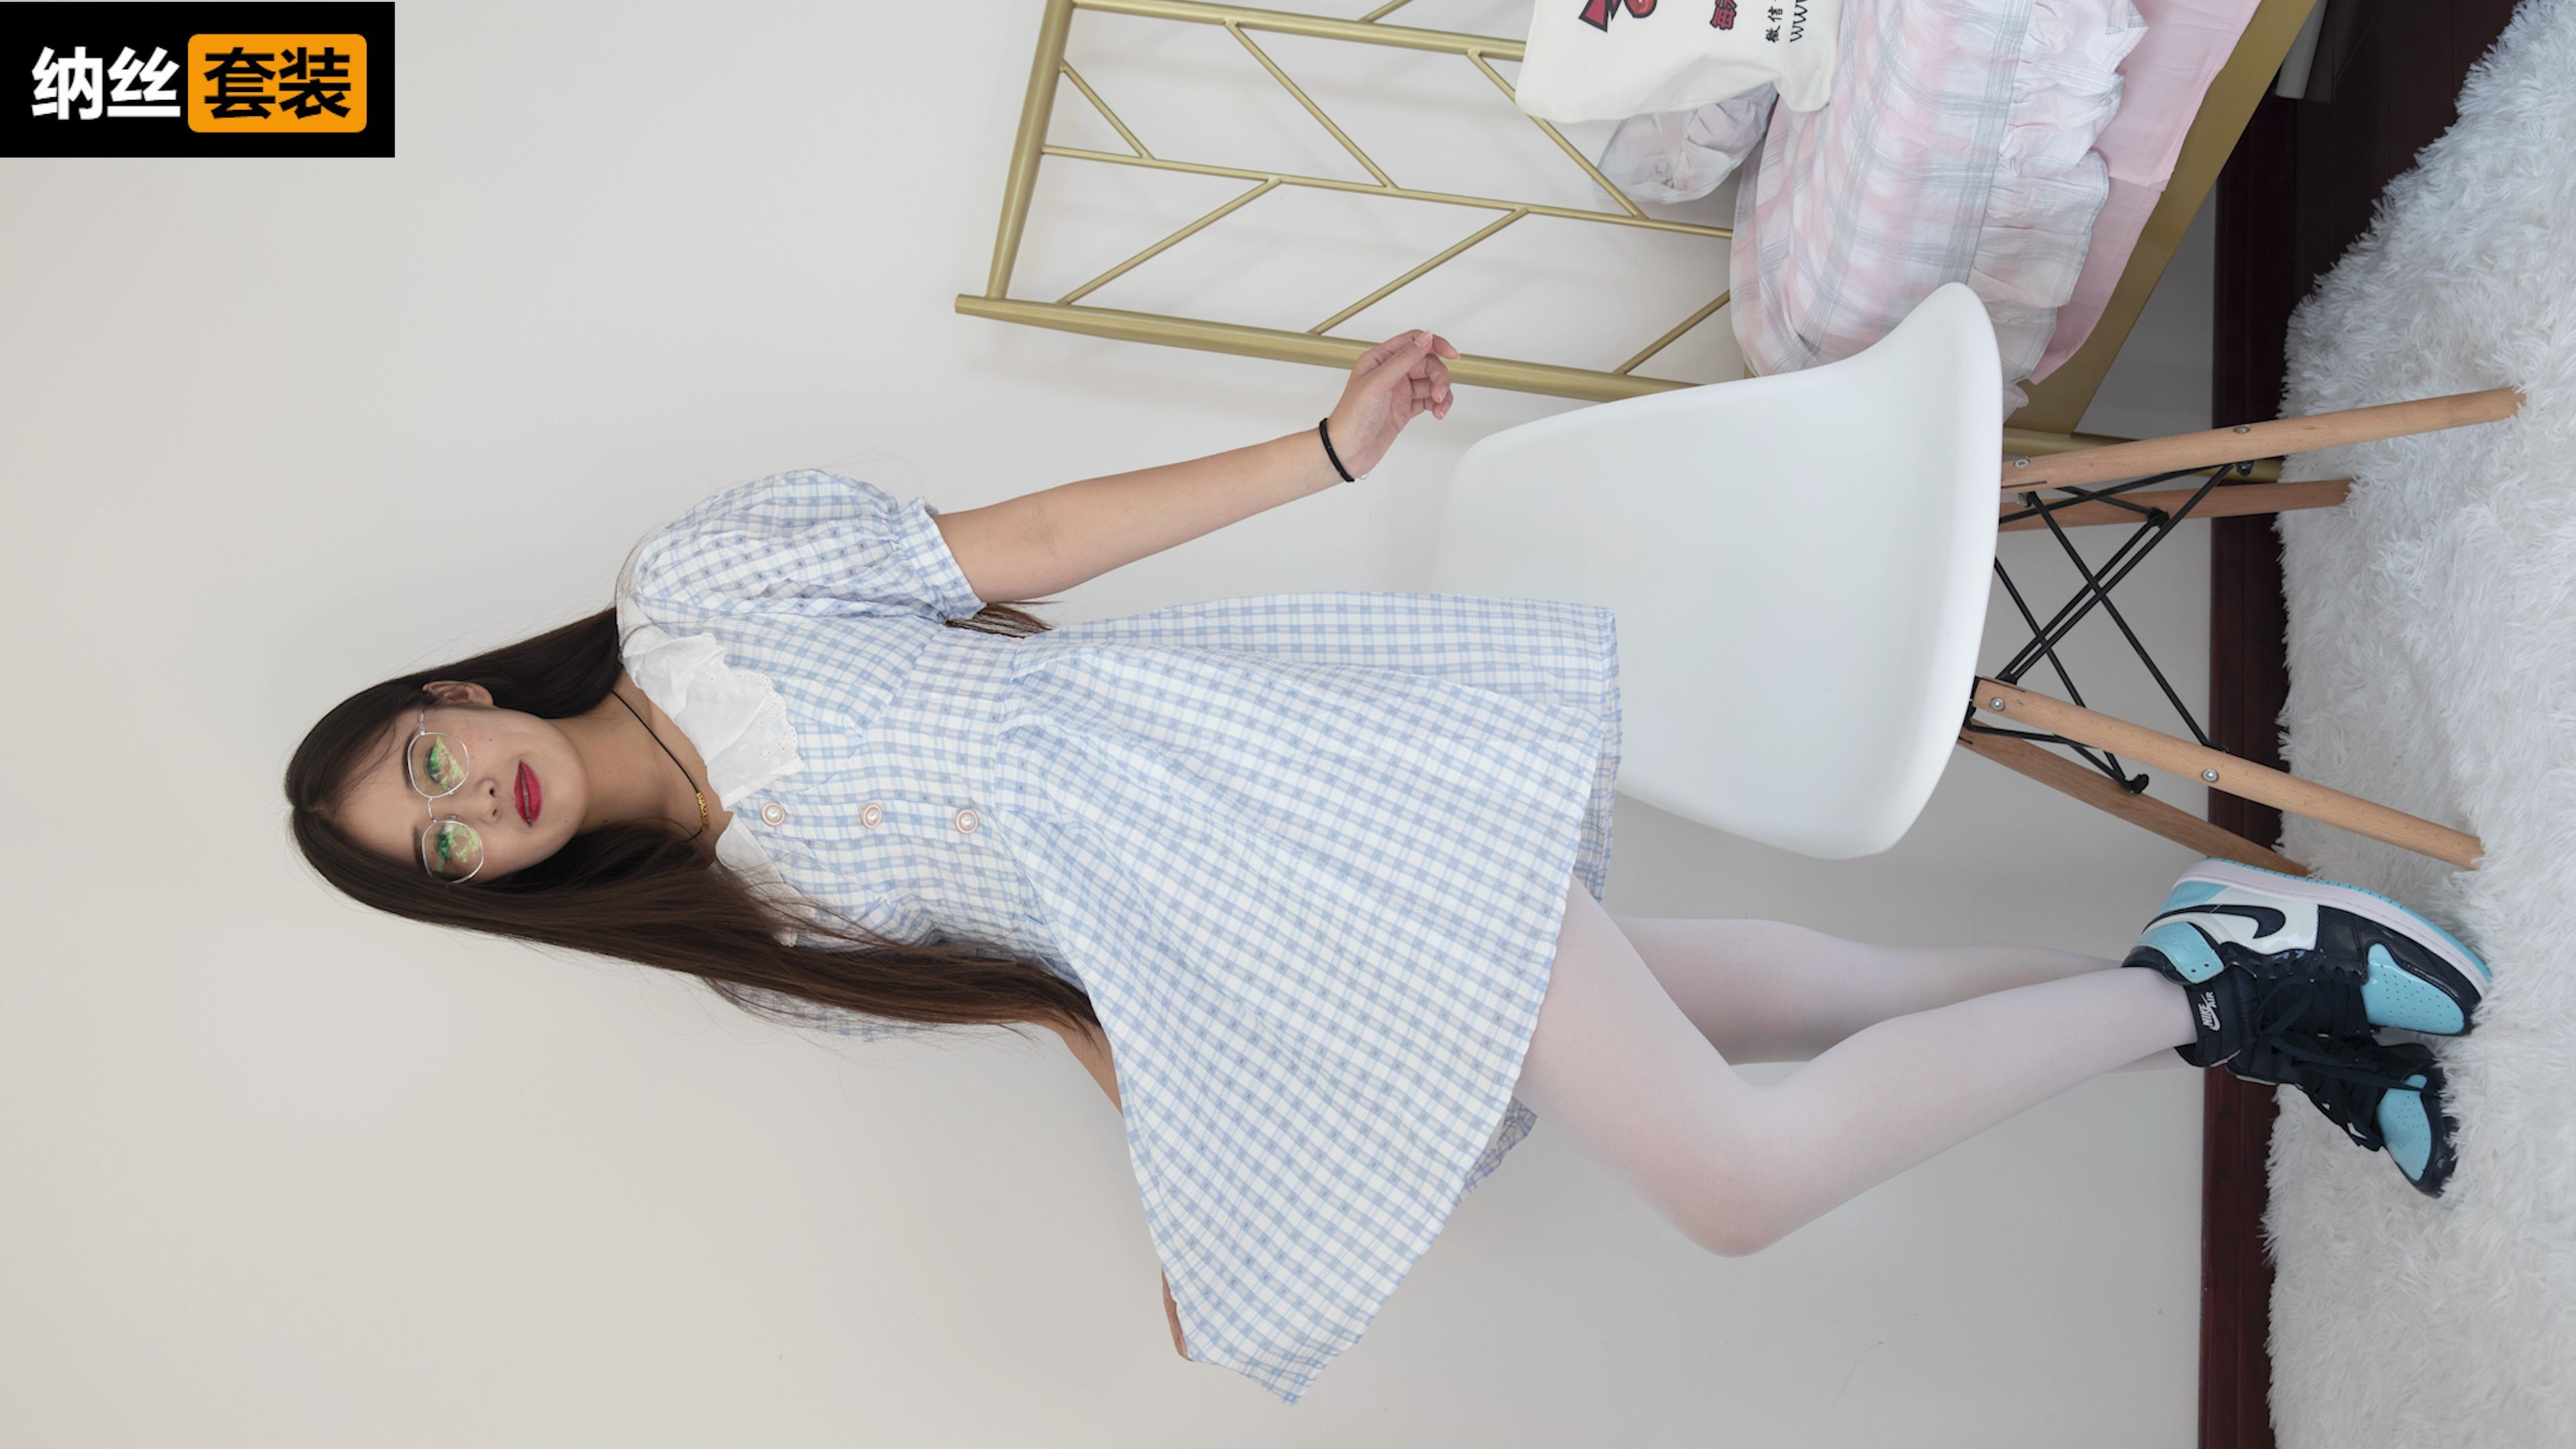 4K 美女白丝AJ鞋长裙学院风写真拍摄花絮88